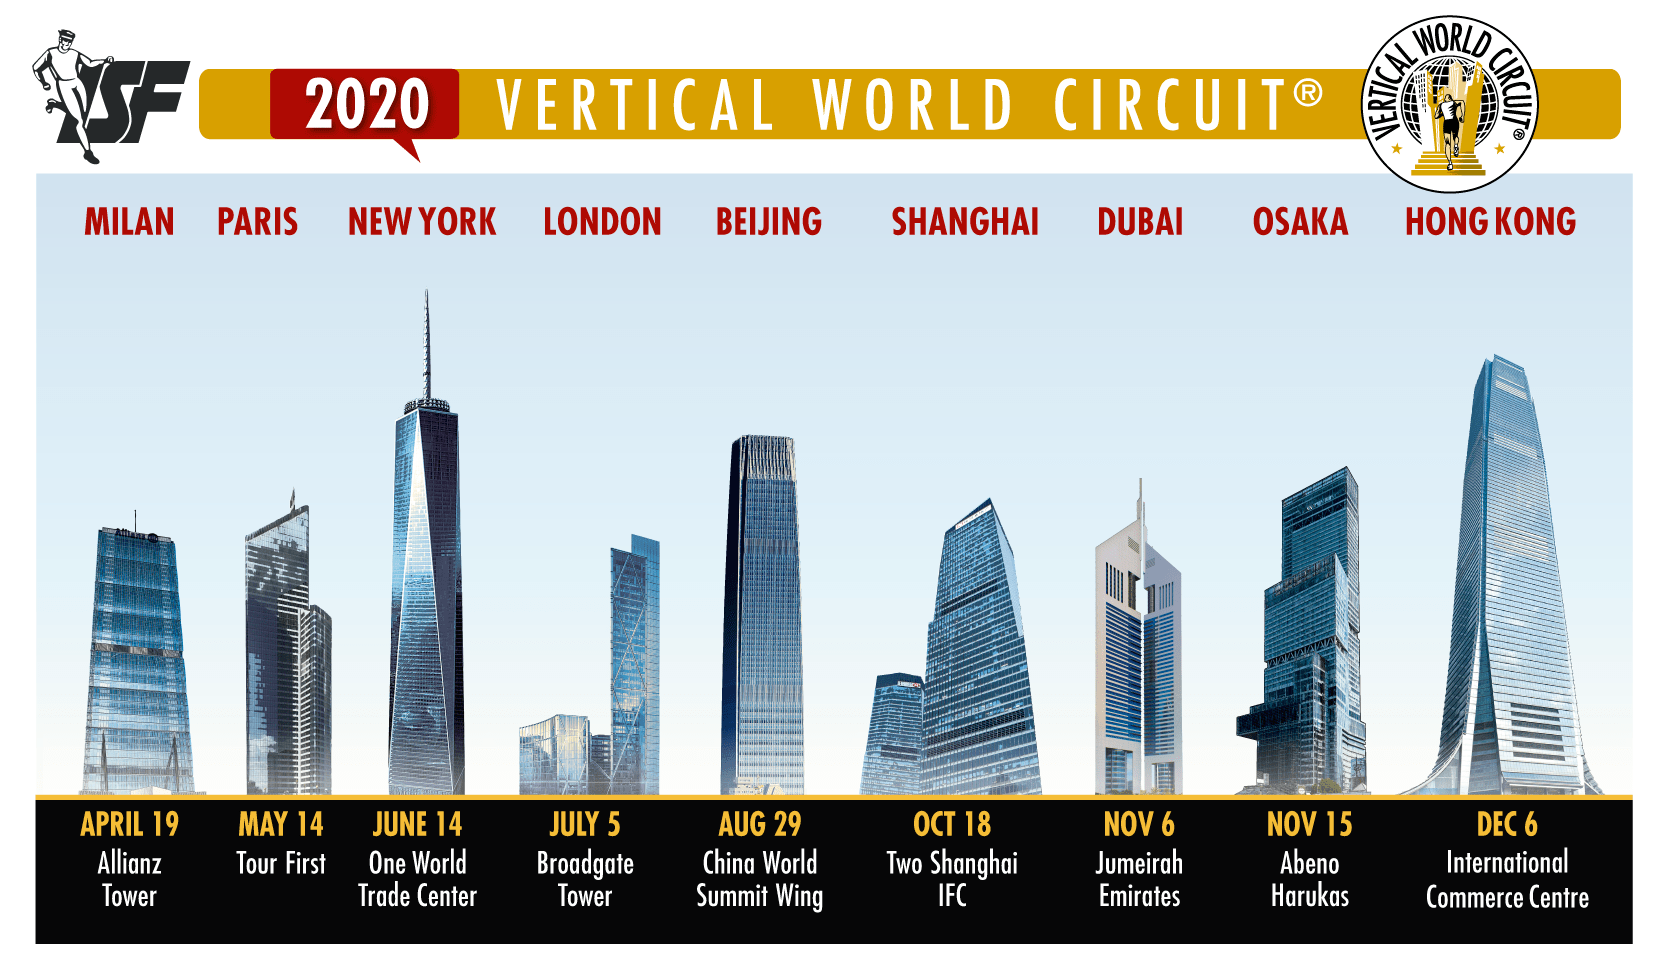 Vertical-World-Circuit-2020-visuel